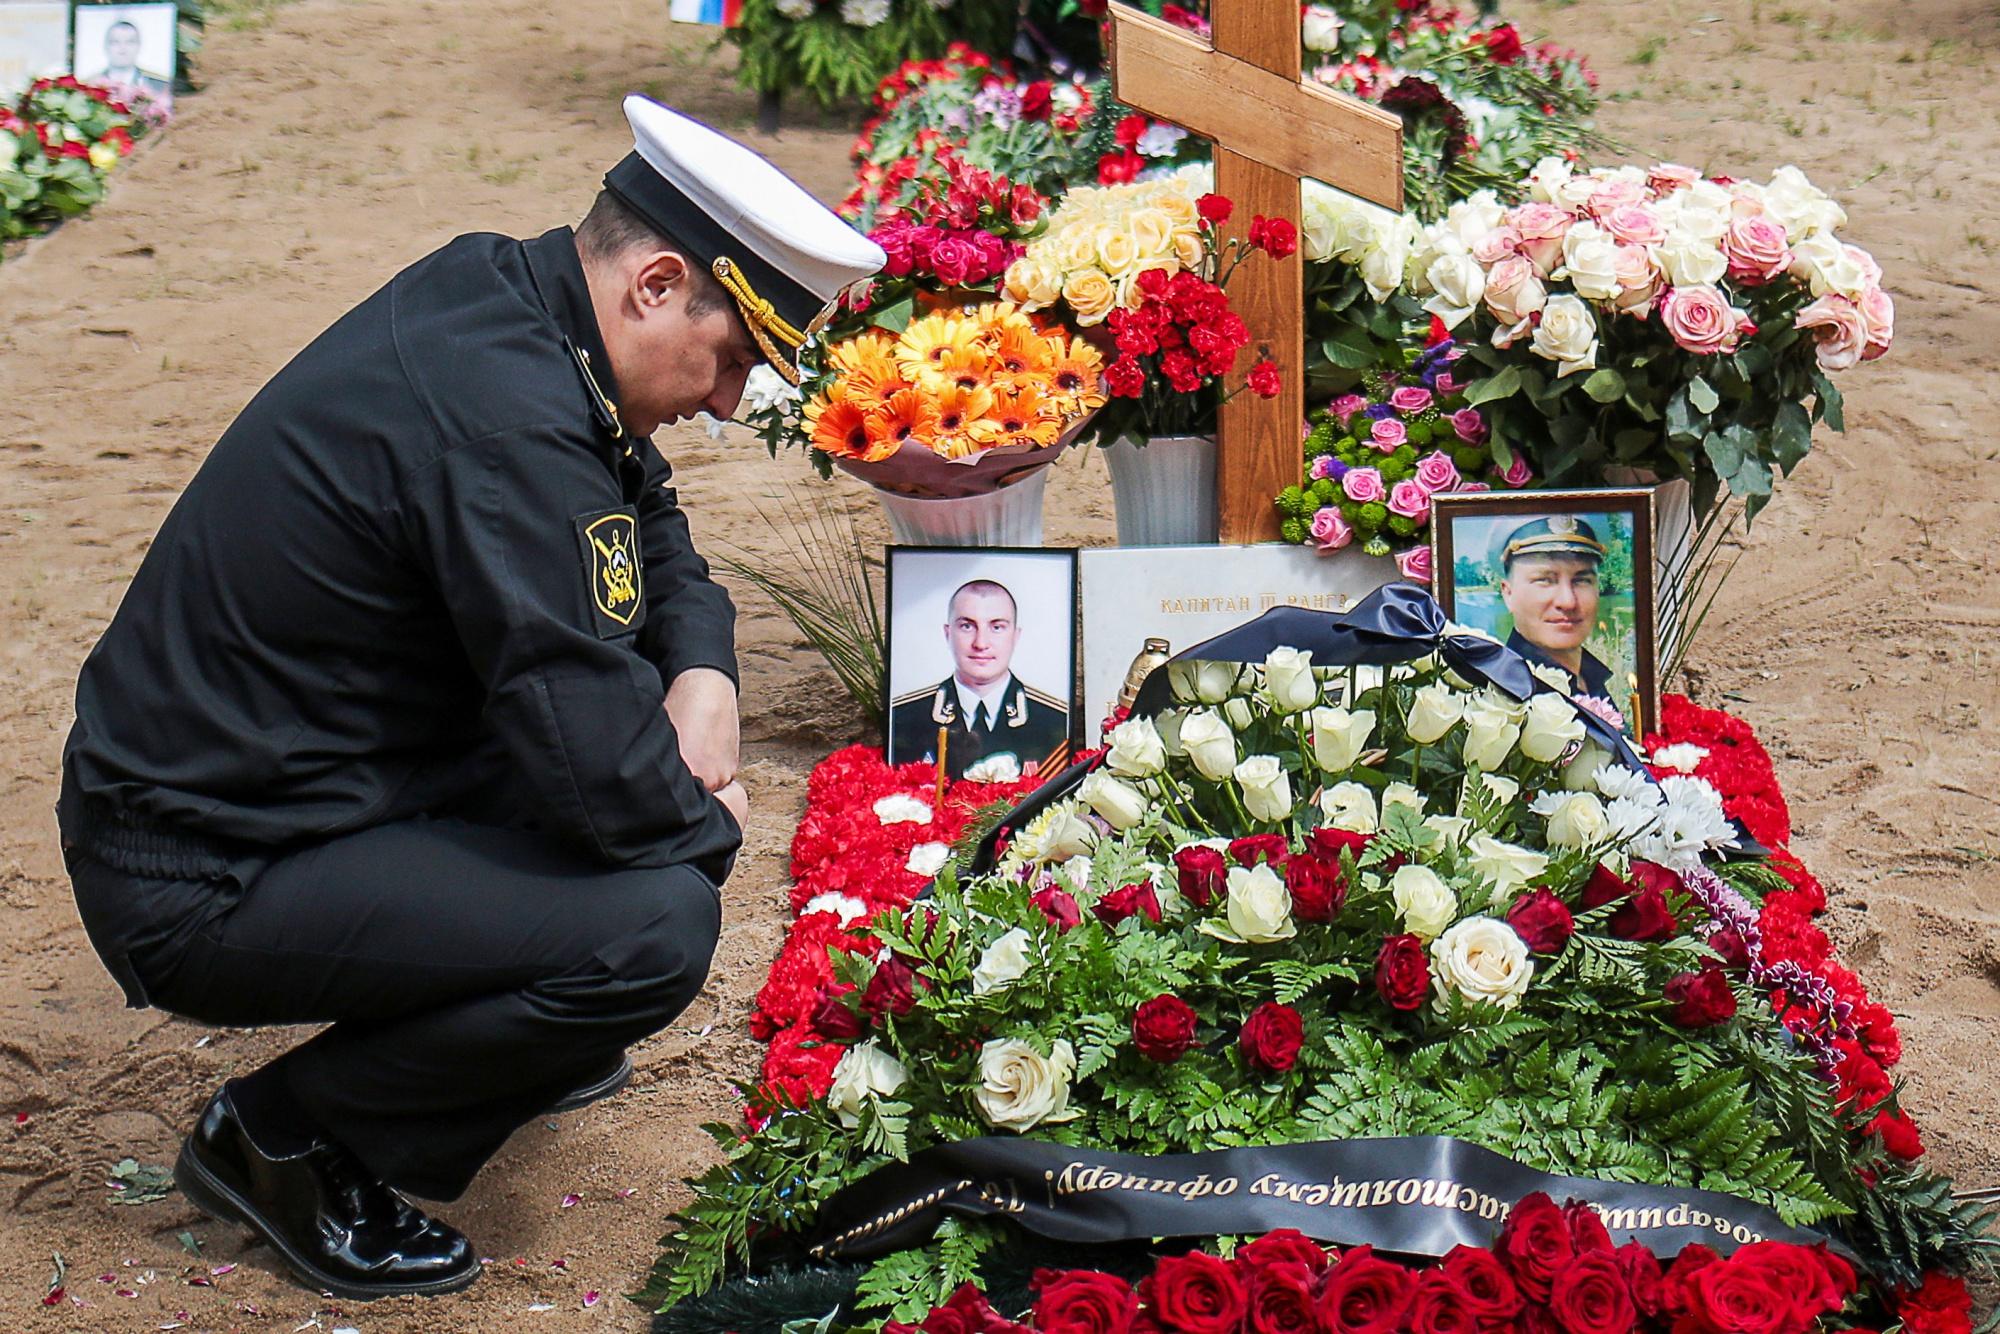 Stricken Russian Nuke Sub Crew Prevented 'Planetary Catastrophe'